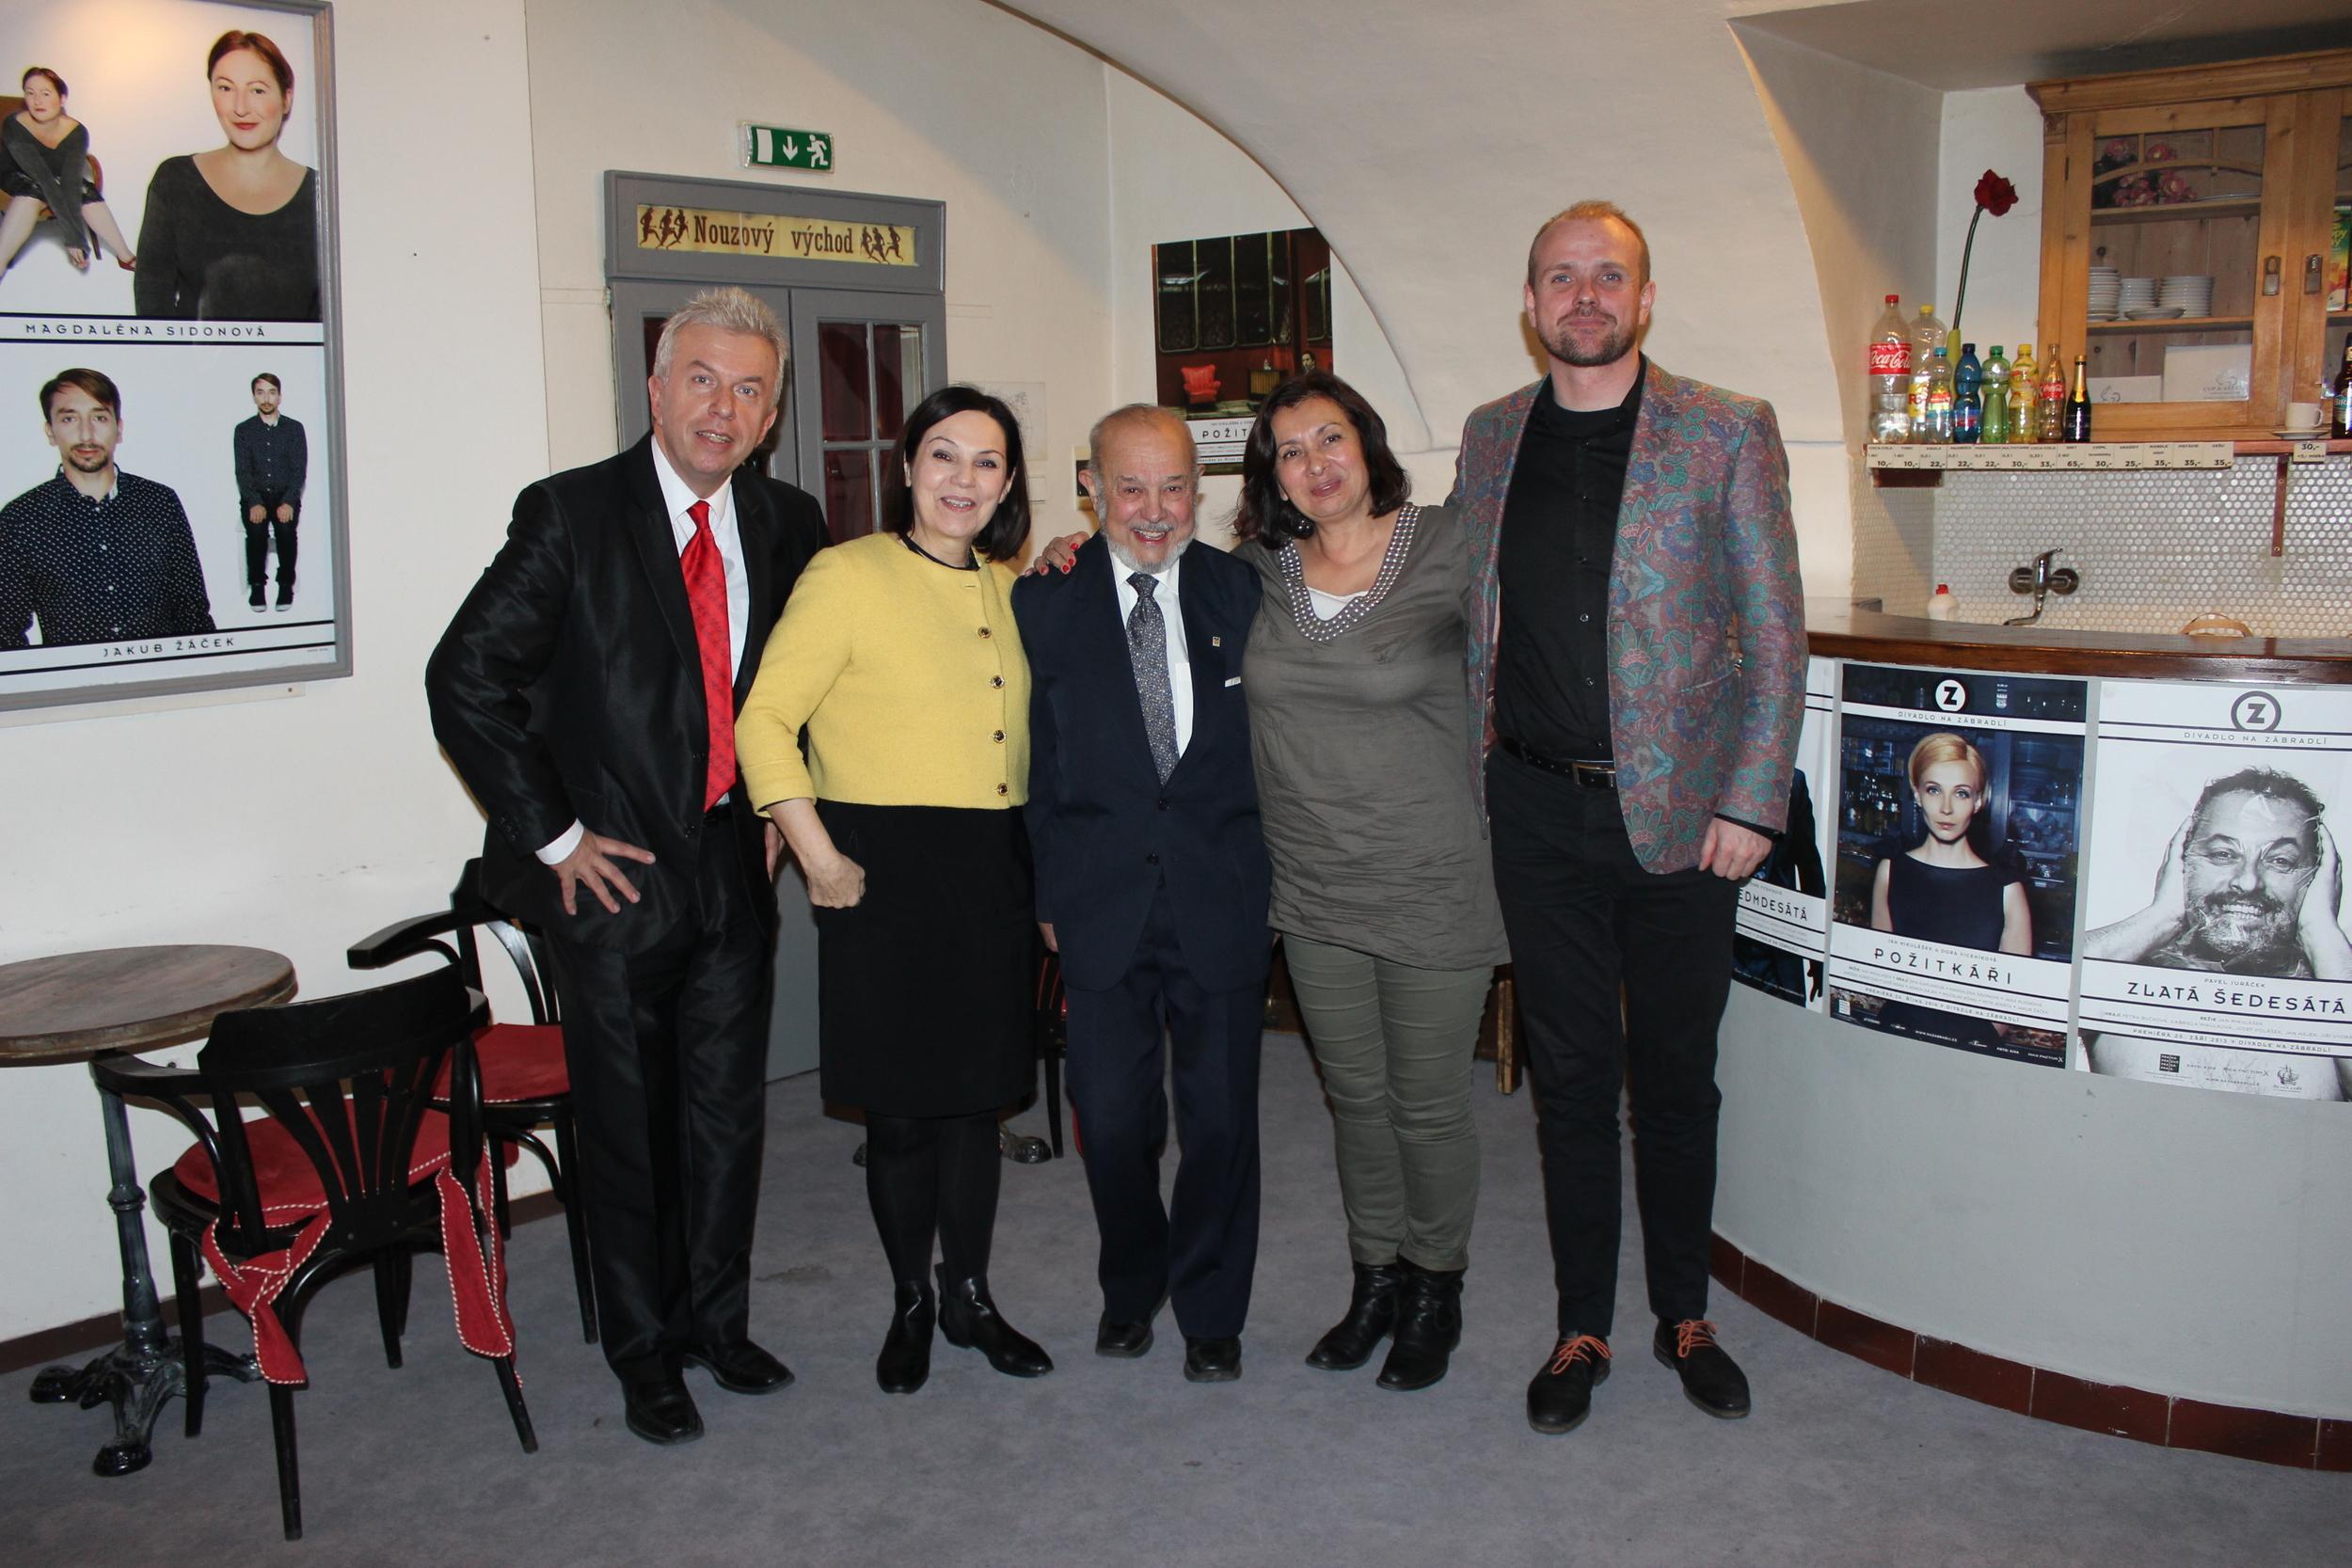 Hlavní porota: (zleva) Jaroslav Svěcený, Ľubomíra Slušná Franz, Karel Holomek, Marie Gailová, Czeslaw Walek (předseda poroty)